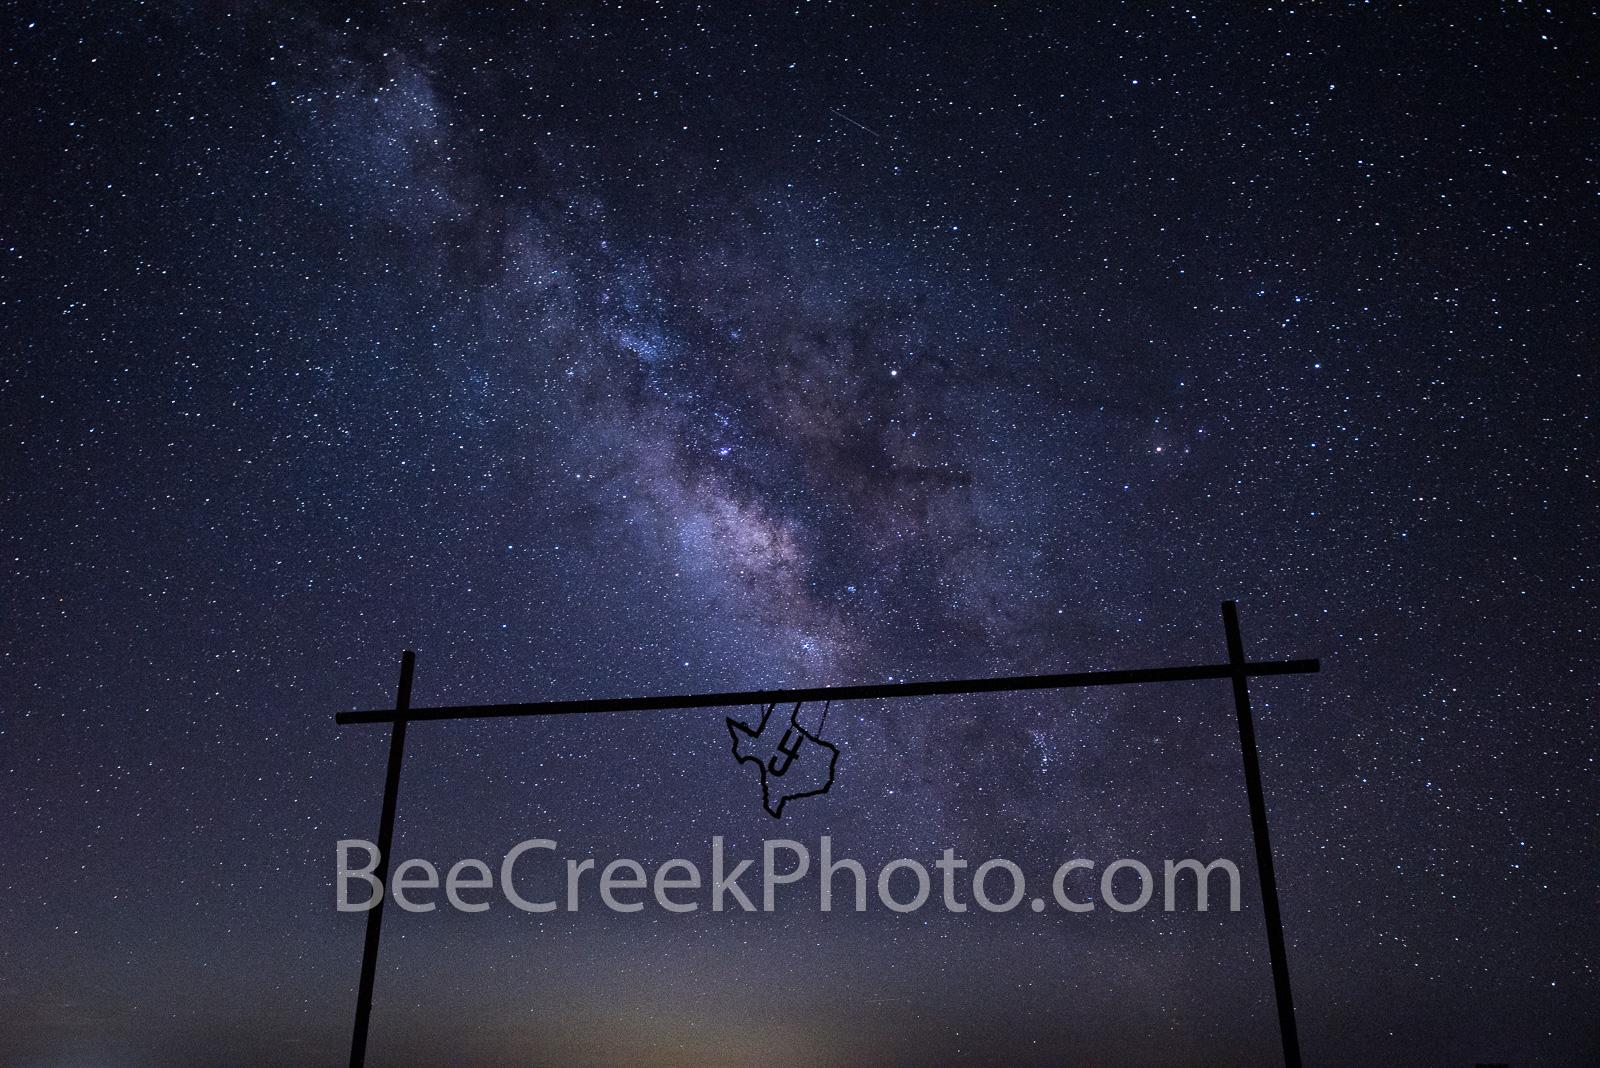 Astronomy, astrophotography, milky way, celestial, gate, ranch, dark,  gallaxy solar system, night, night landscape, night landscapes, night photo, star images, starry, Texas, milky way in texas, Texa, photo